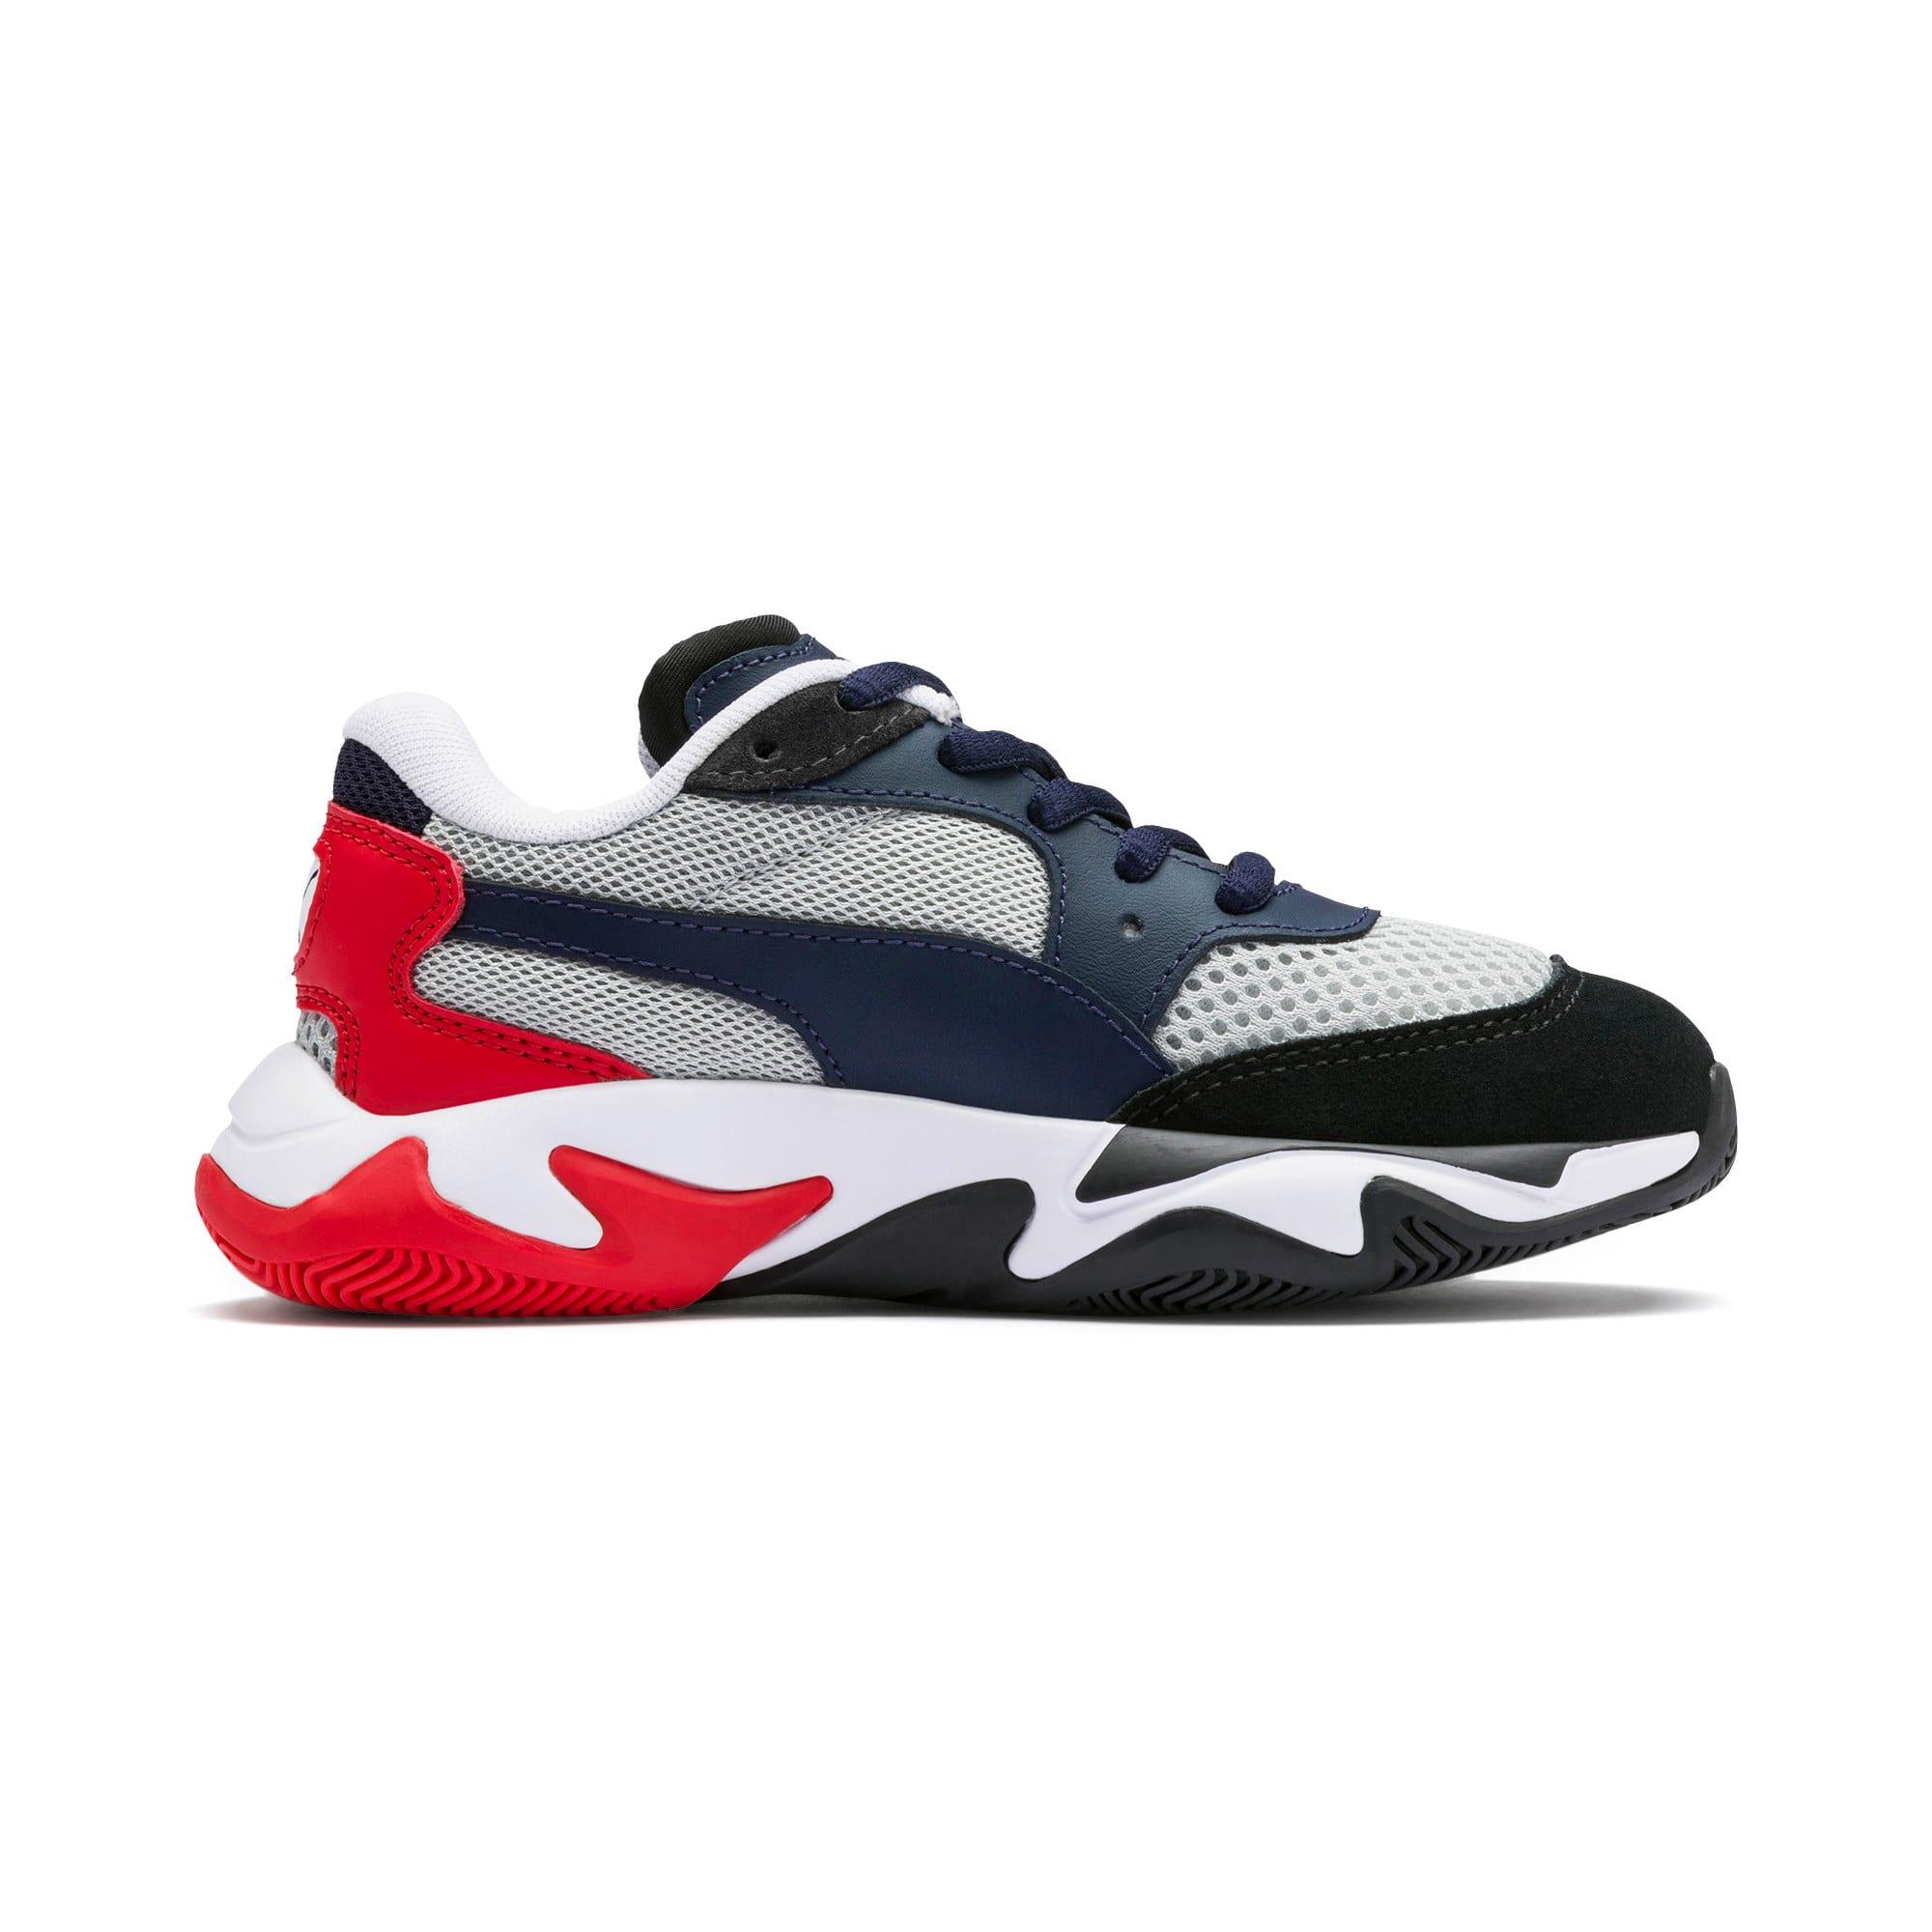 Imagen en miniatura 5 de Zapatillas de niño Storm Origin, Puma Black-High Rise, mediana